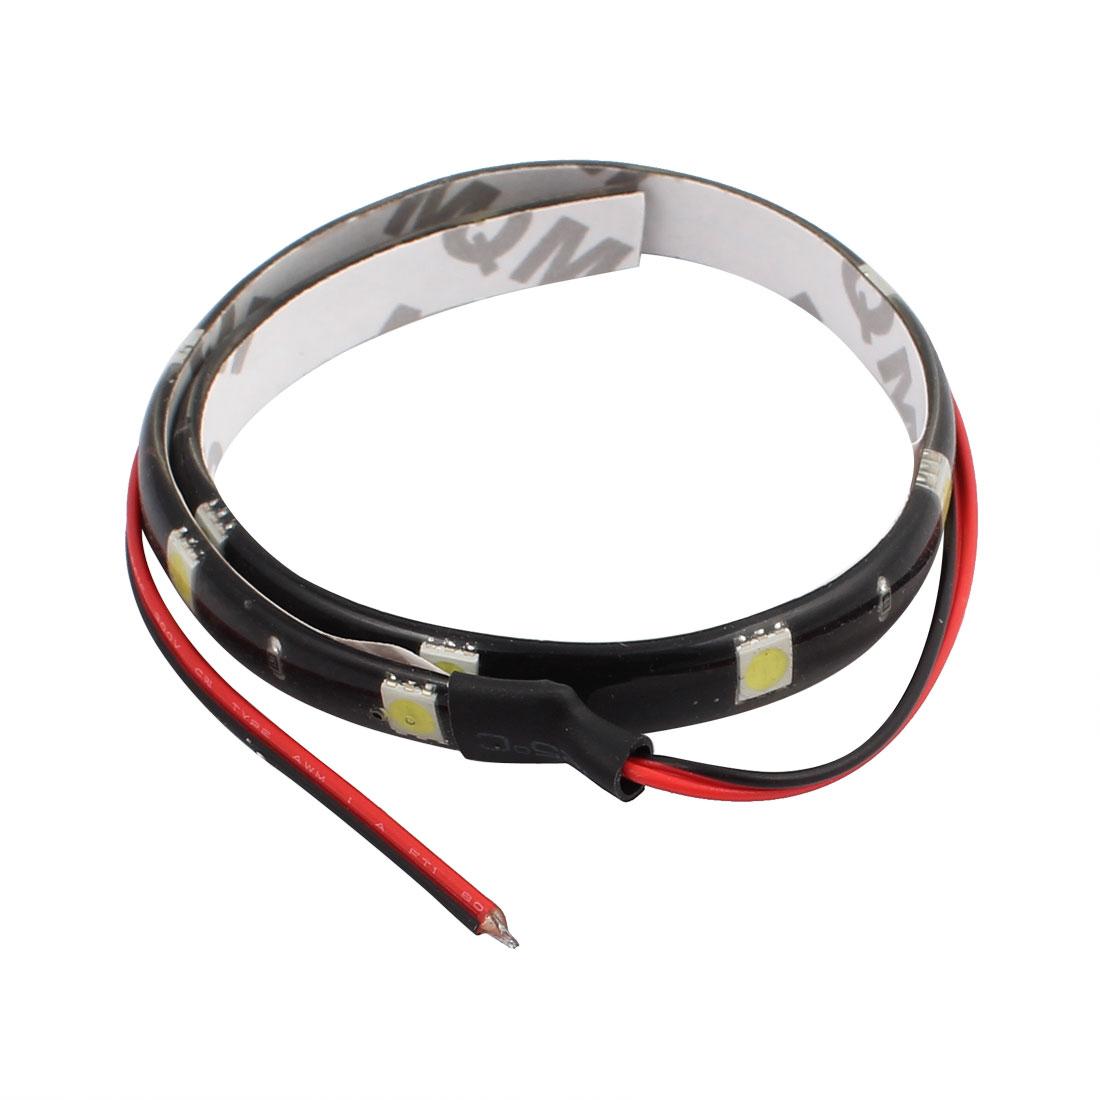 60CM 12V RGB 50mm x 50mm White LED Strip Light For Motorcycle or Car decorative lights